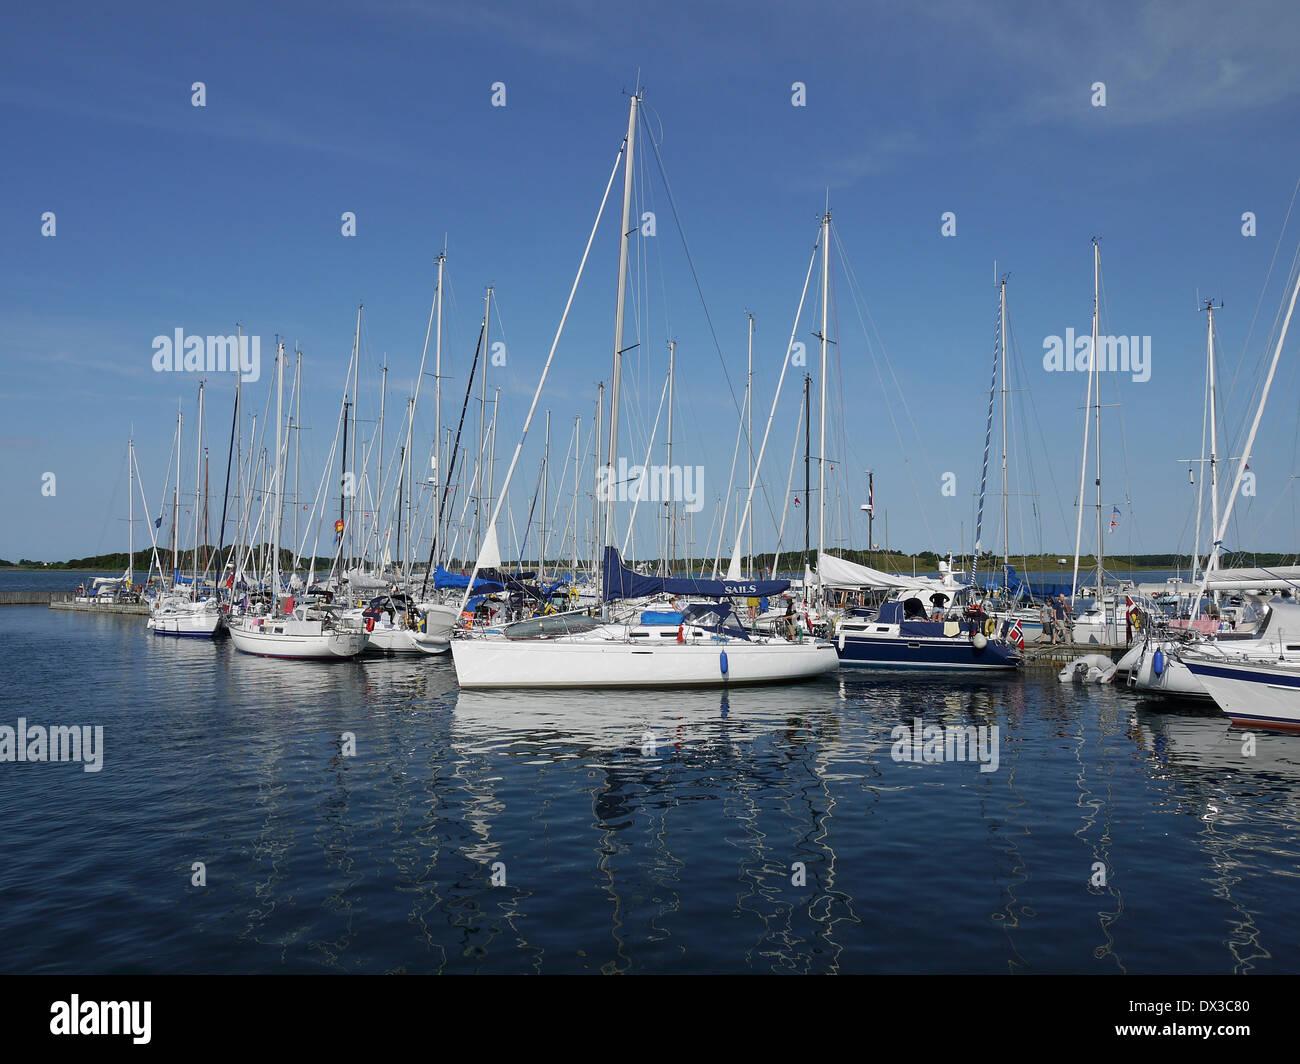 port at samsø, kattegat, denmark - Stock Image